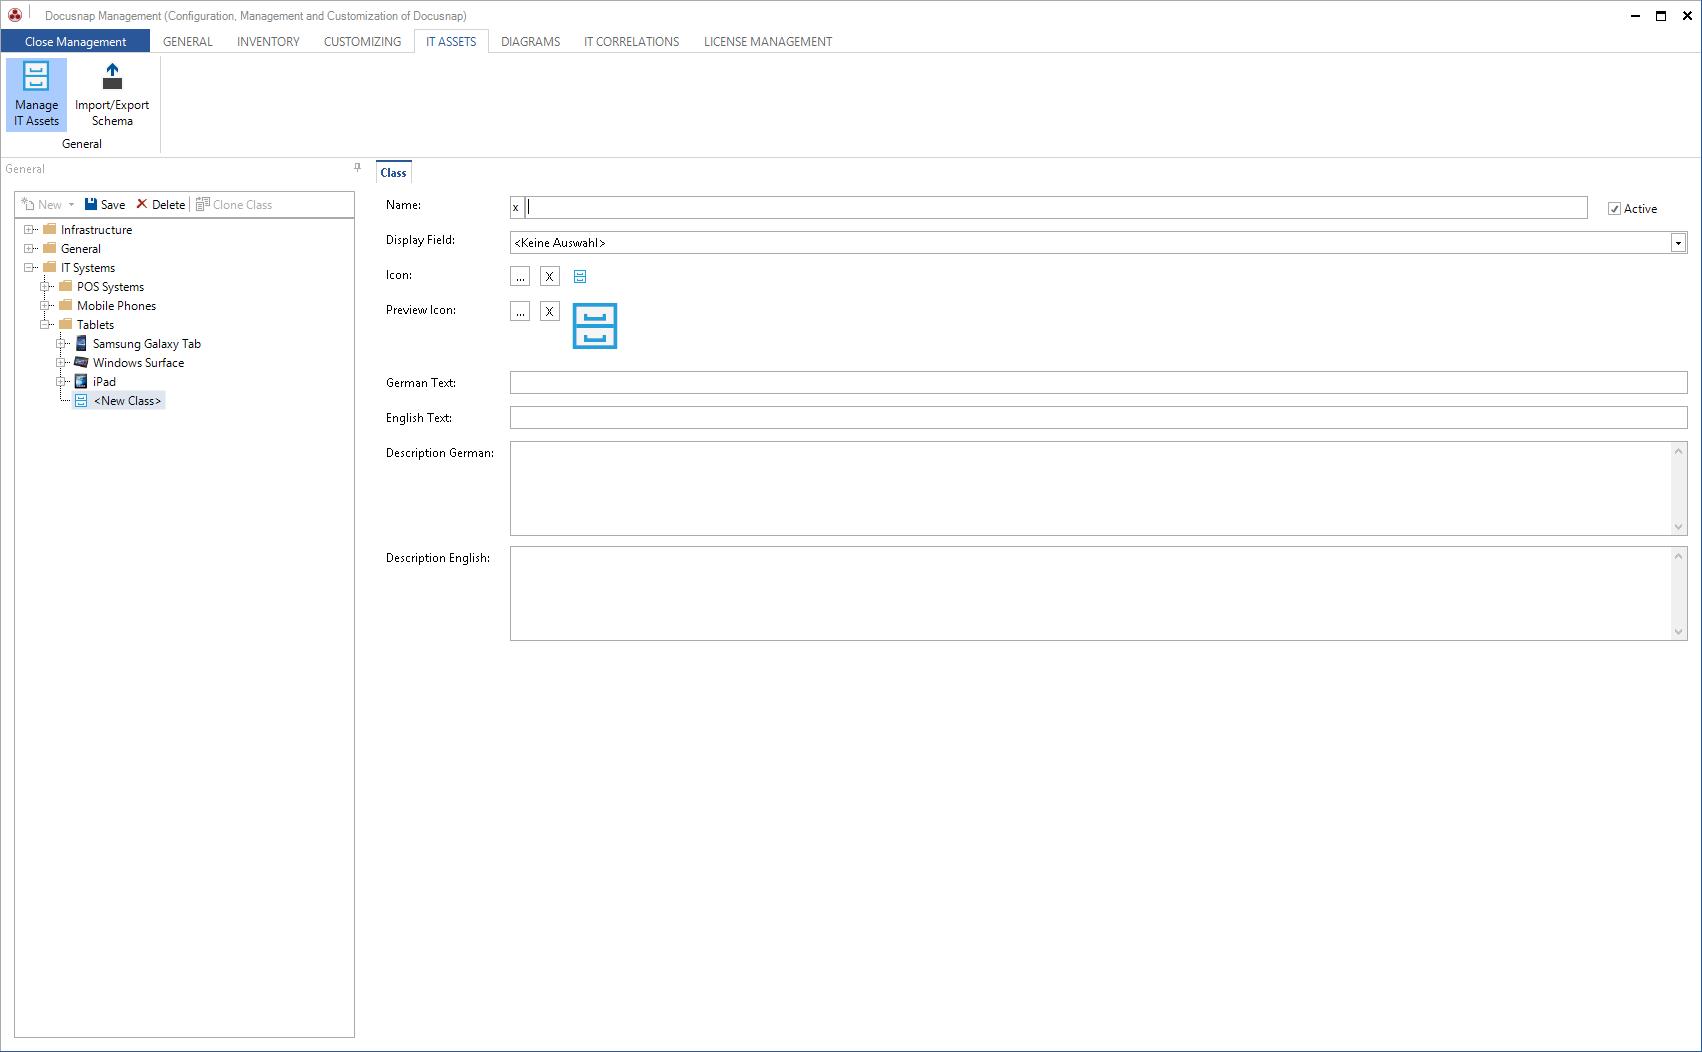 Screenshot: Importing IT asset data